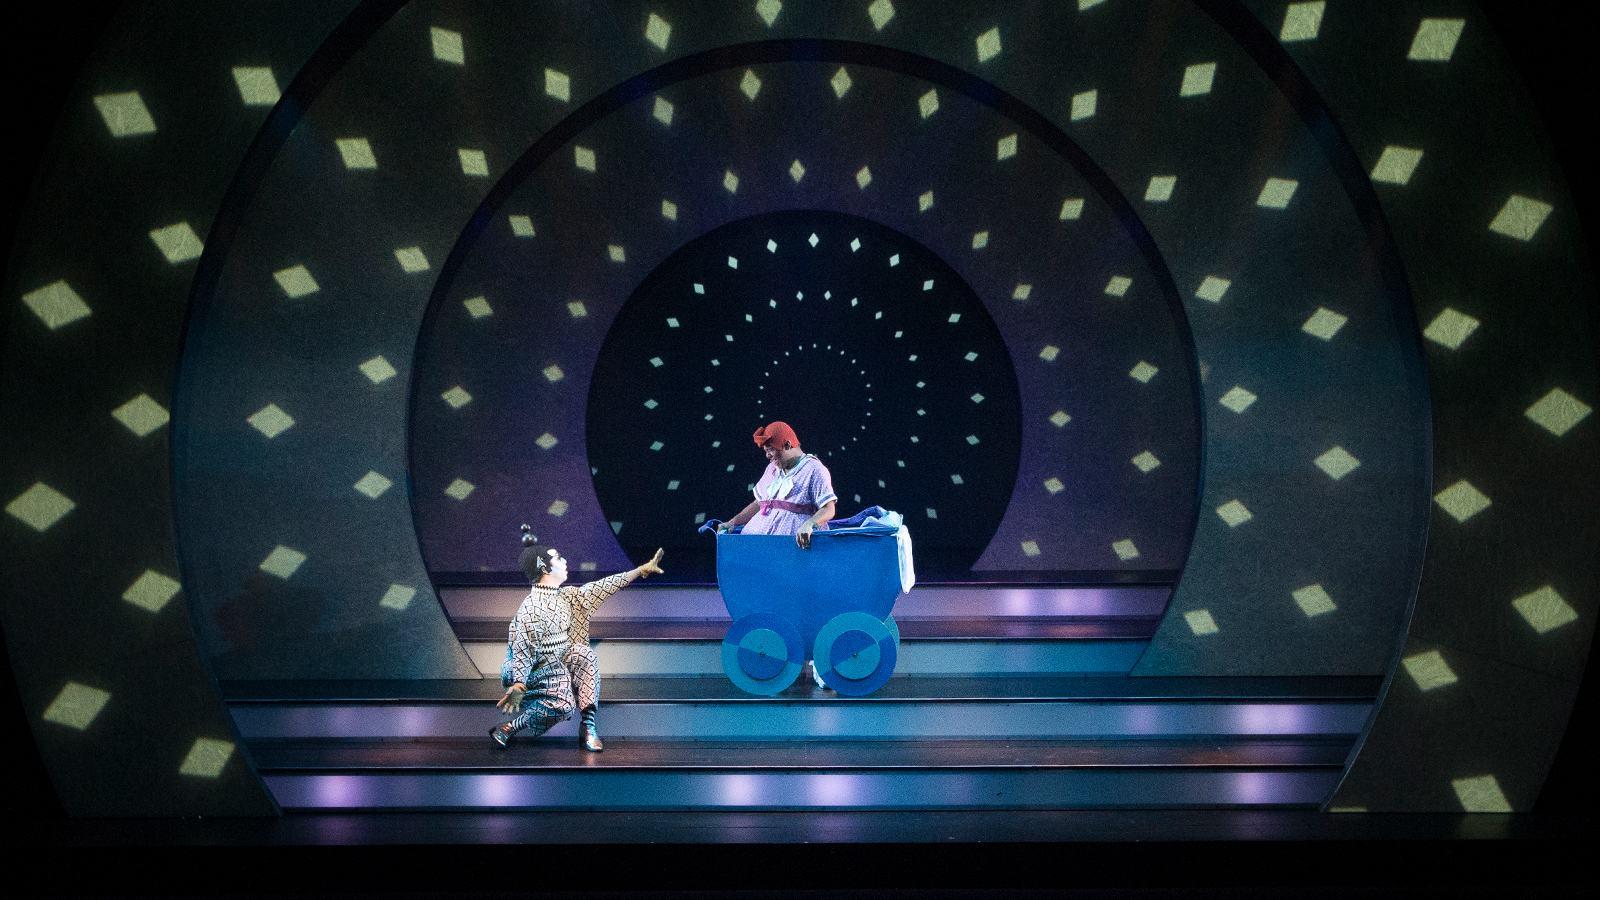 Rumpelstiltskin performing on stage